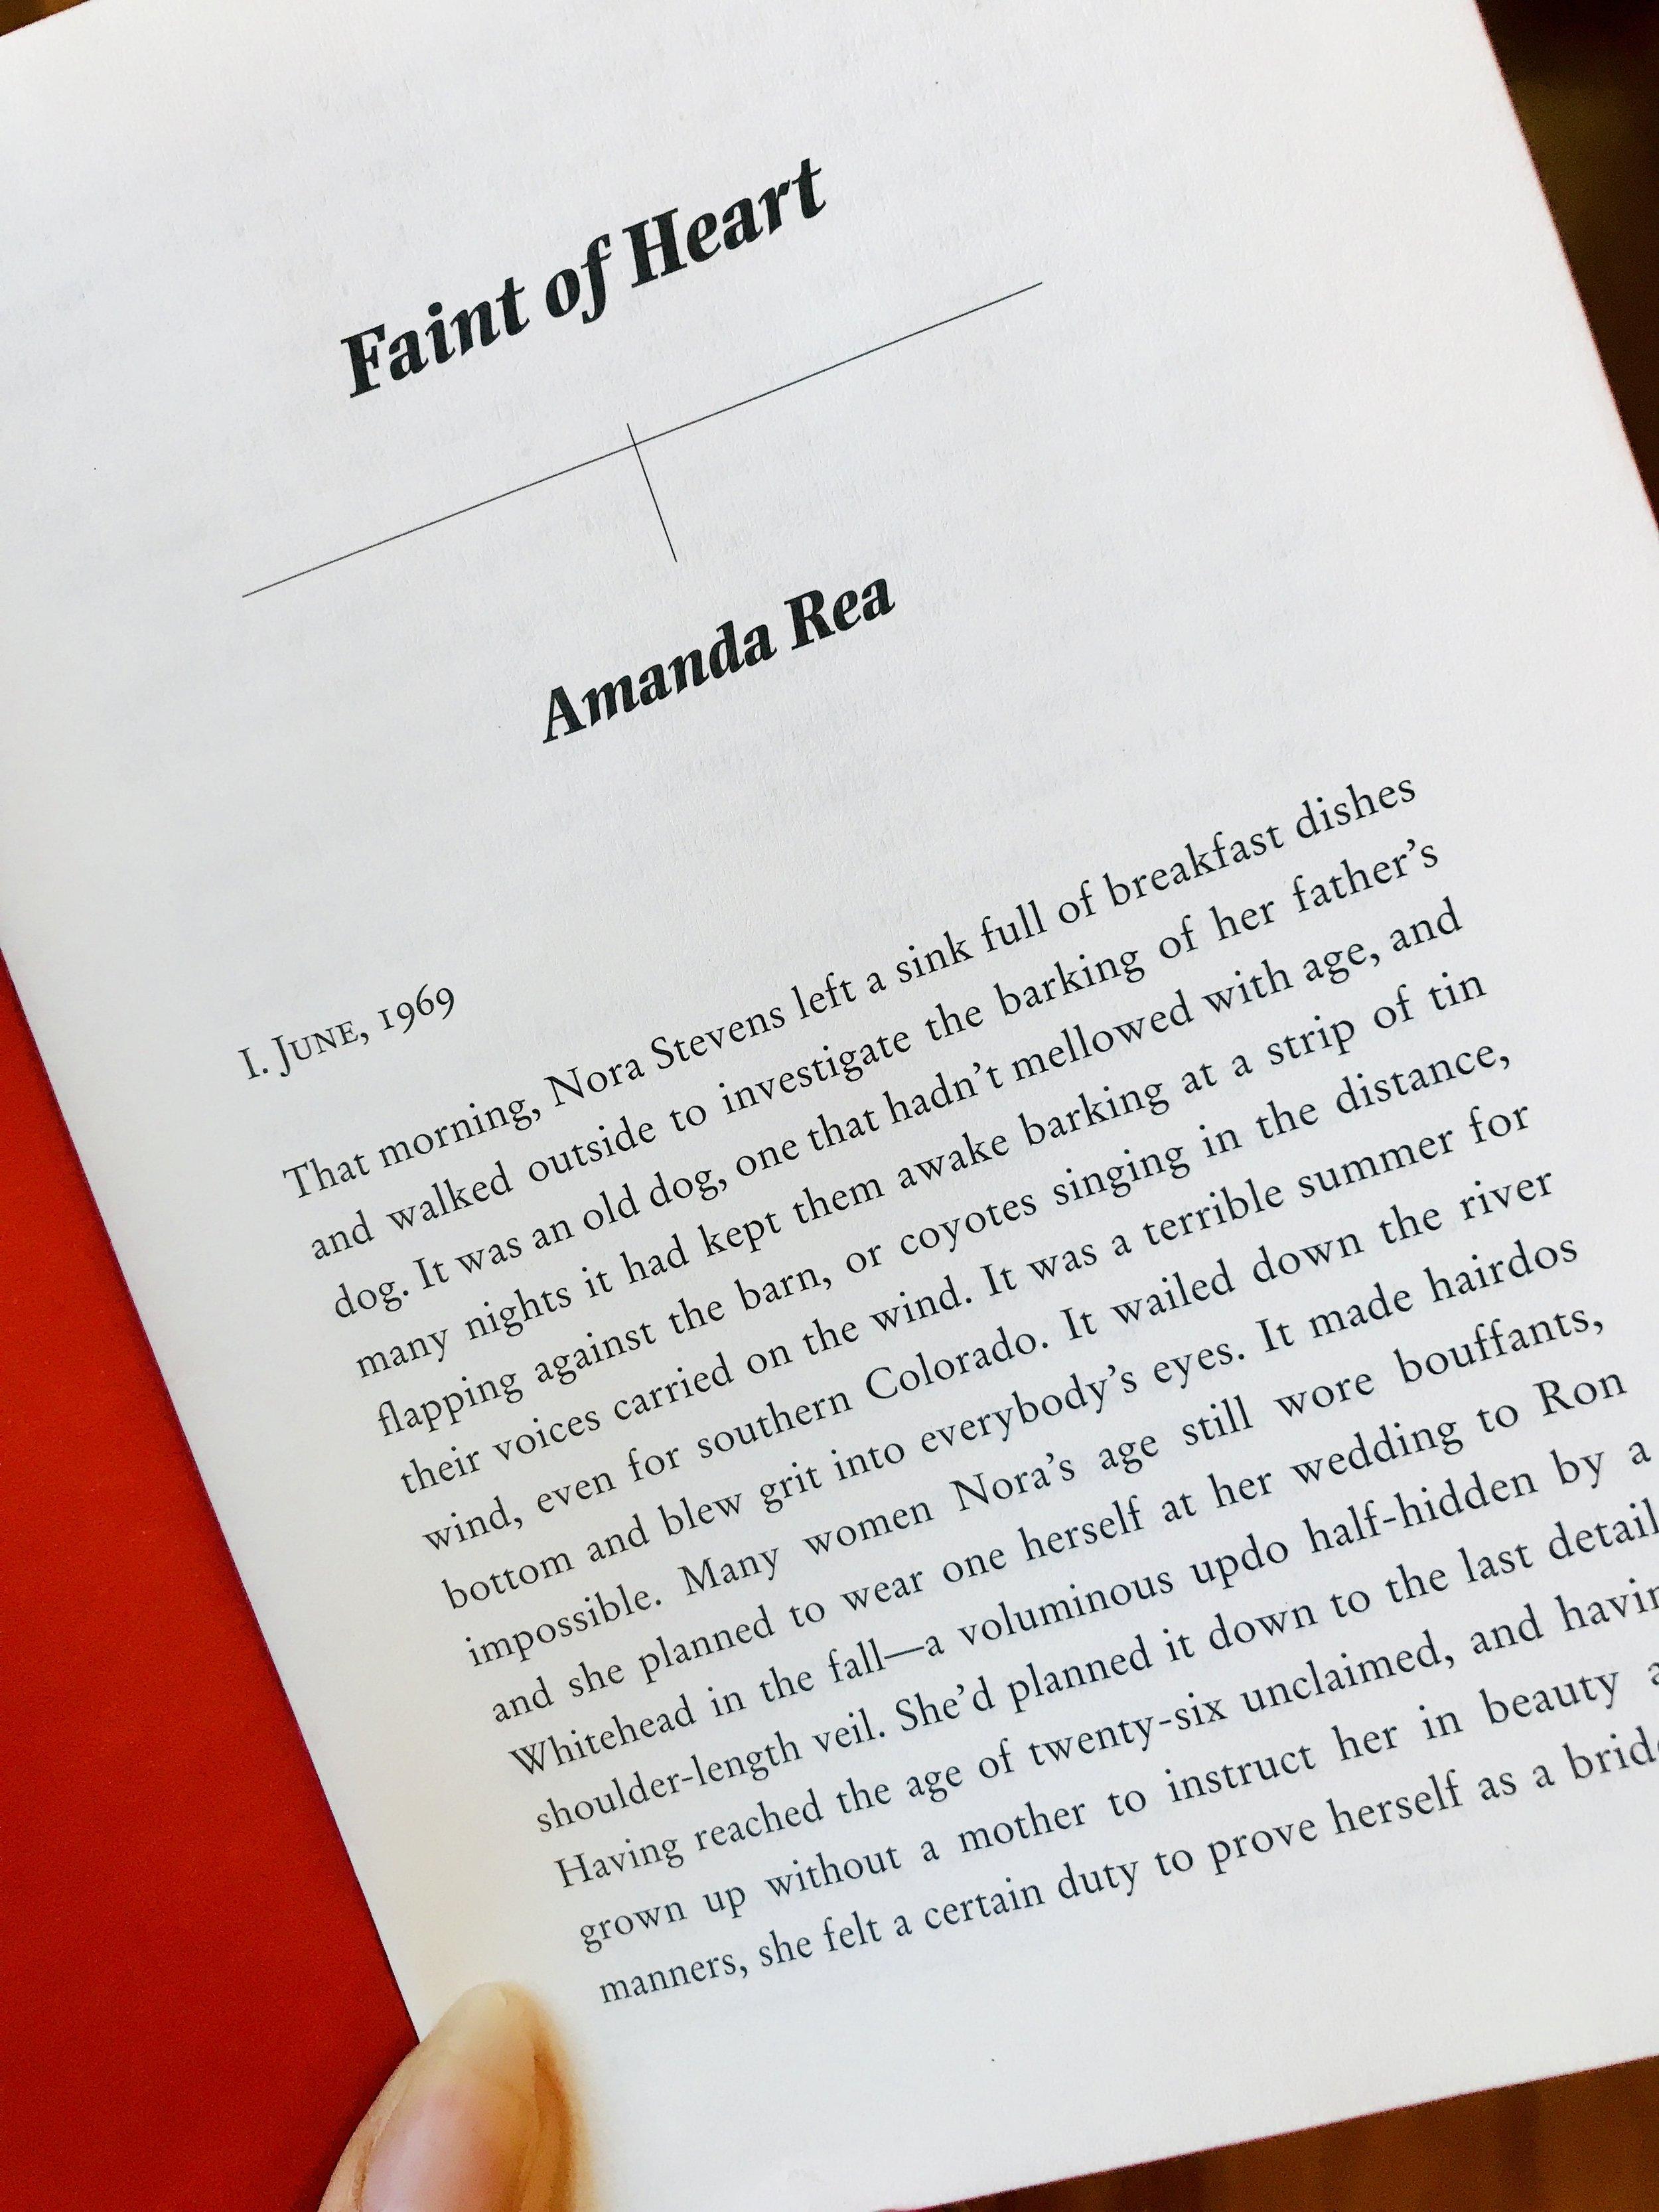 Amanda Rea_FaintofHeart_Fiction_2018_OneStory.jpg